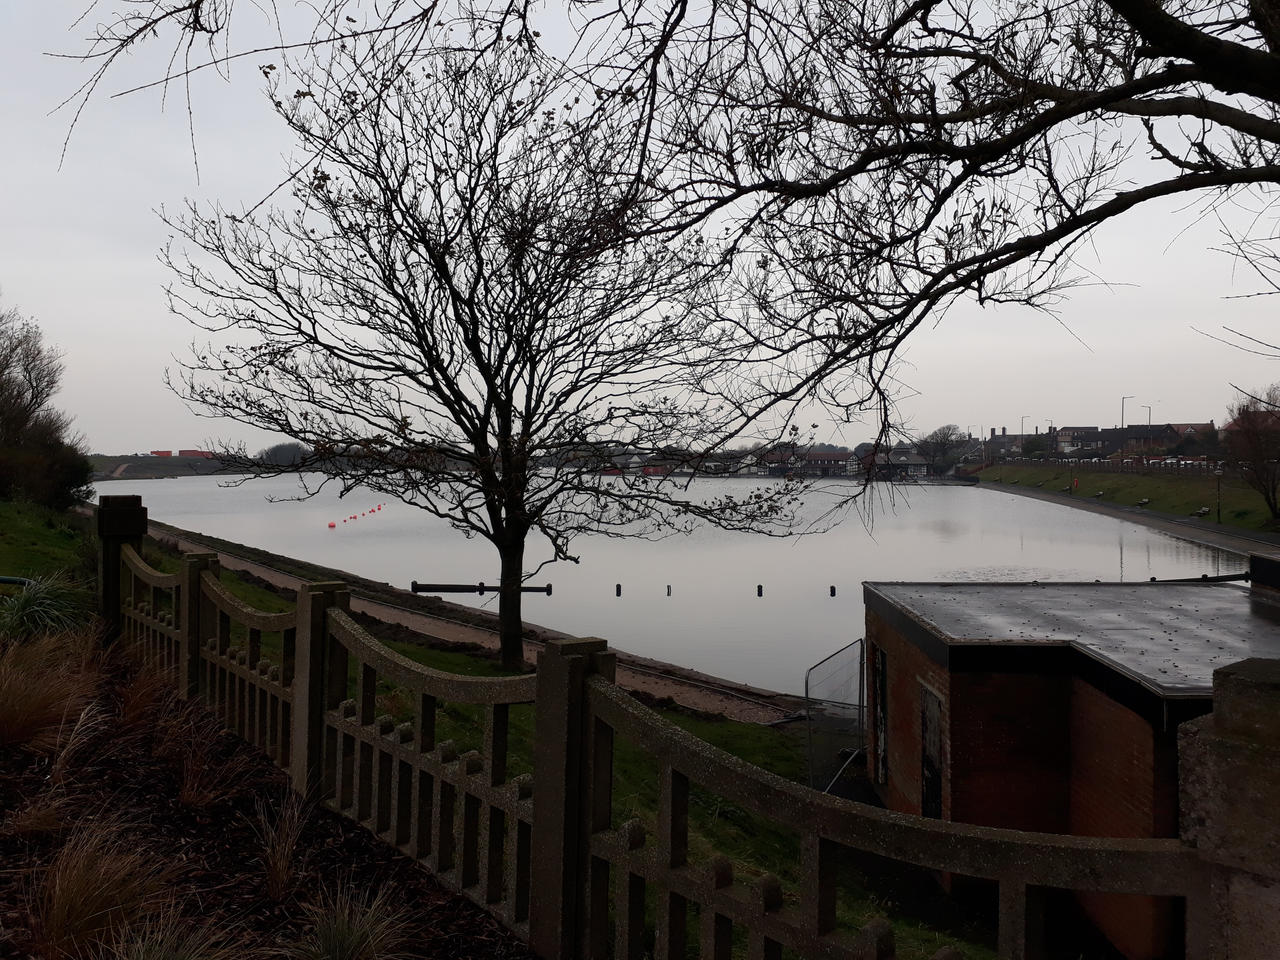 20201108 Fairhaven lake